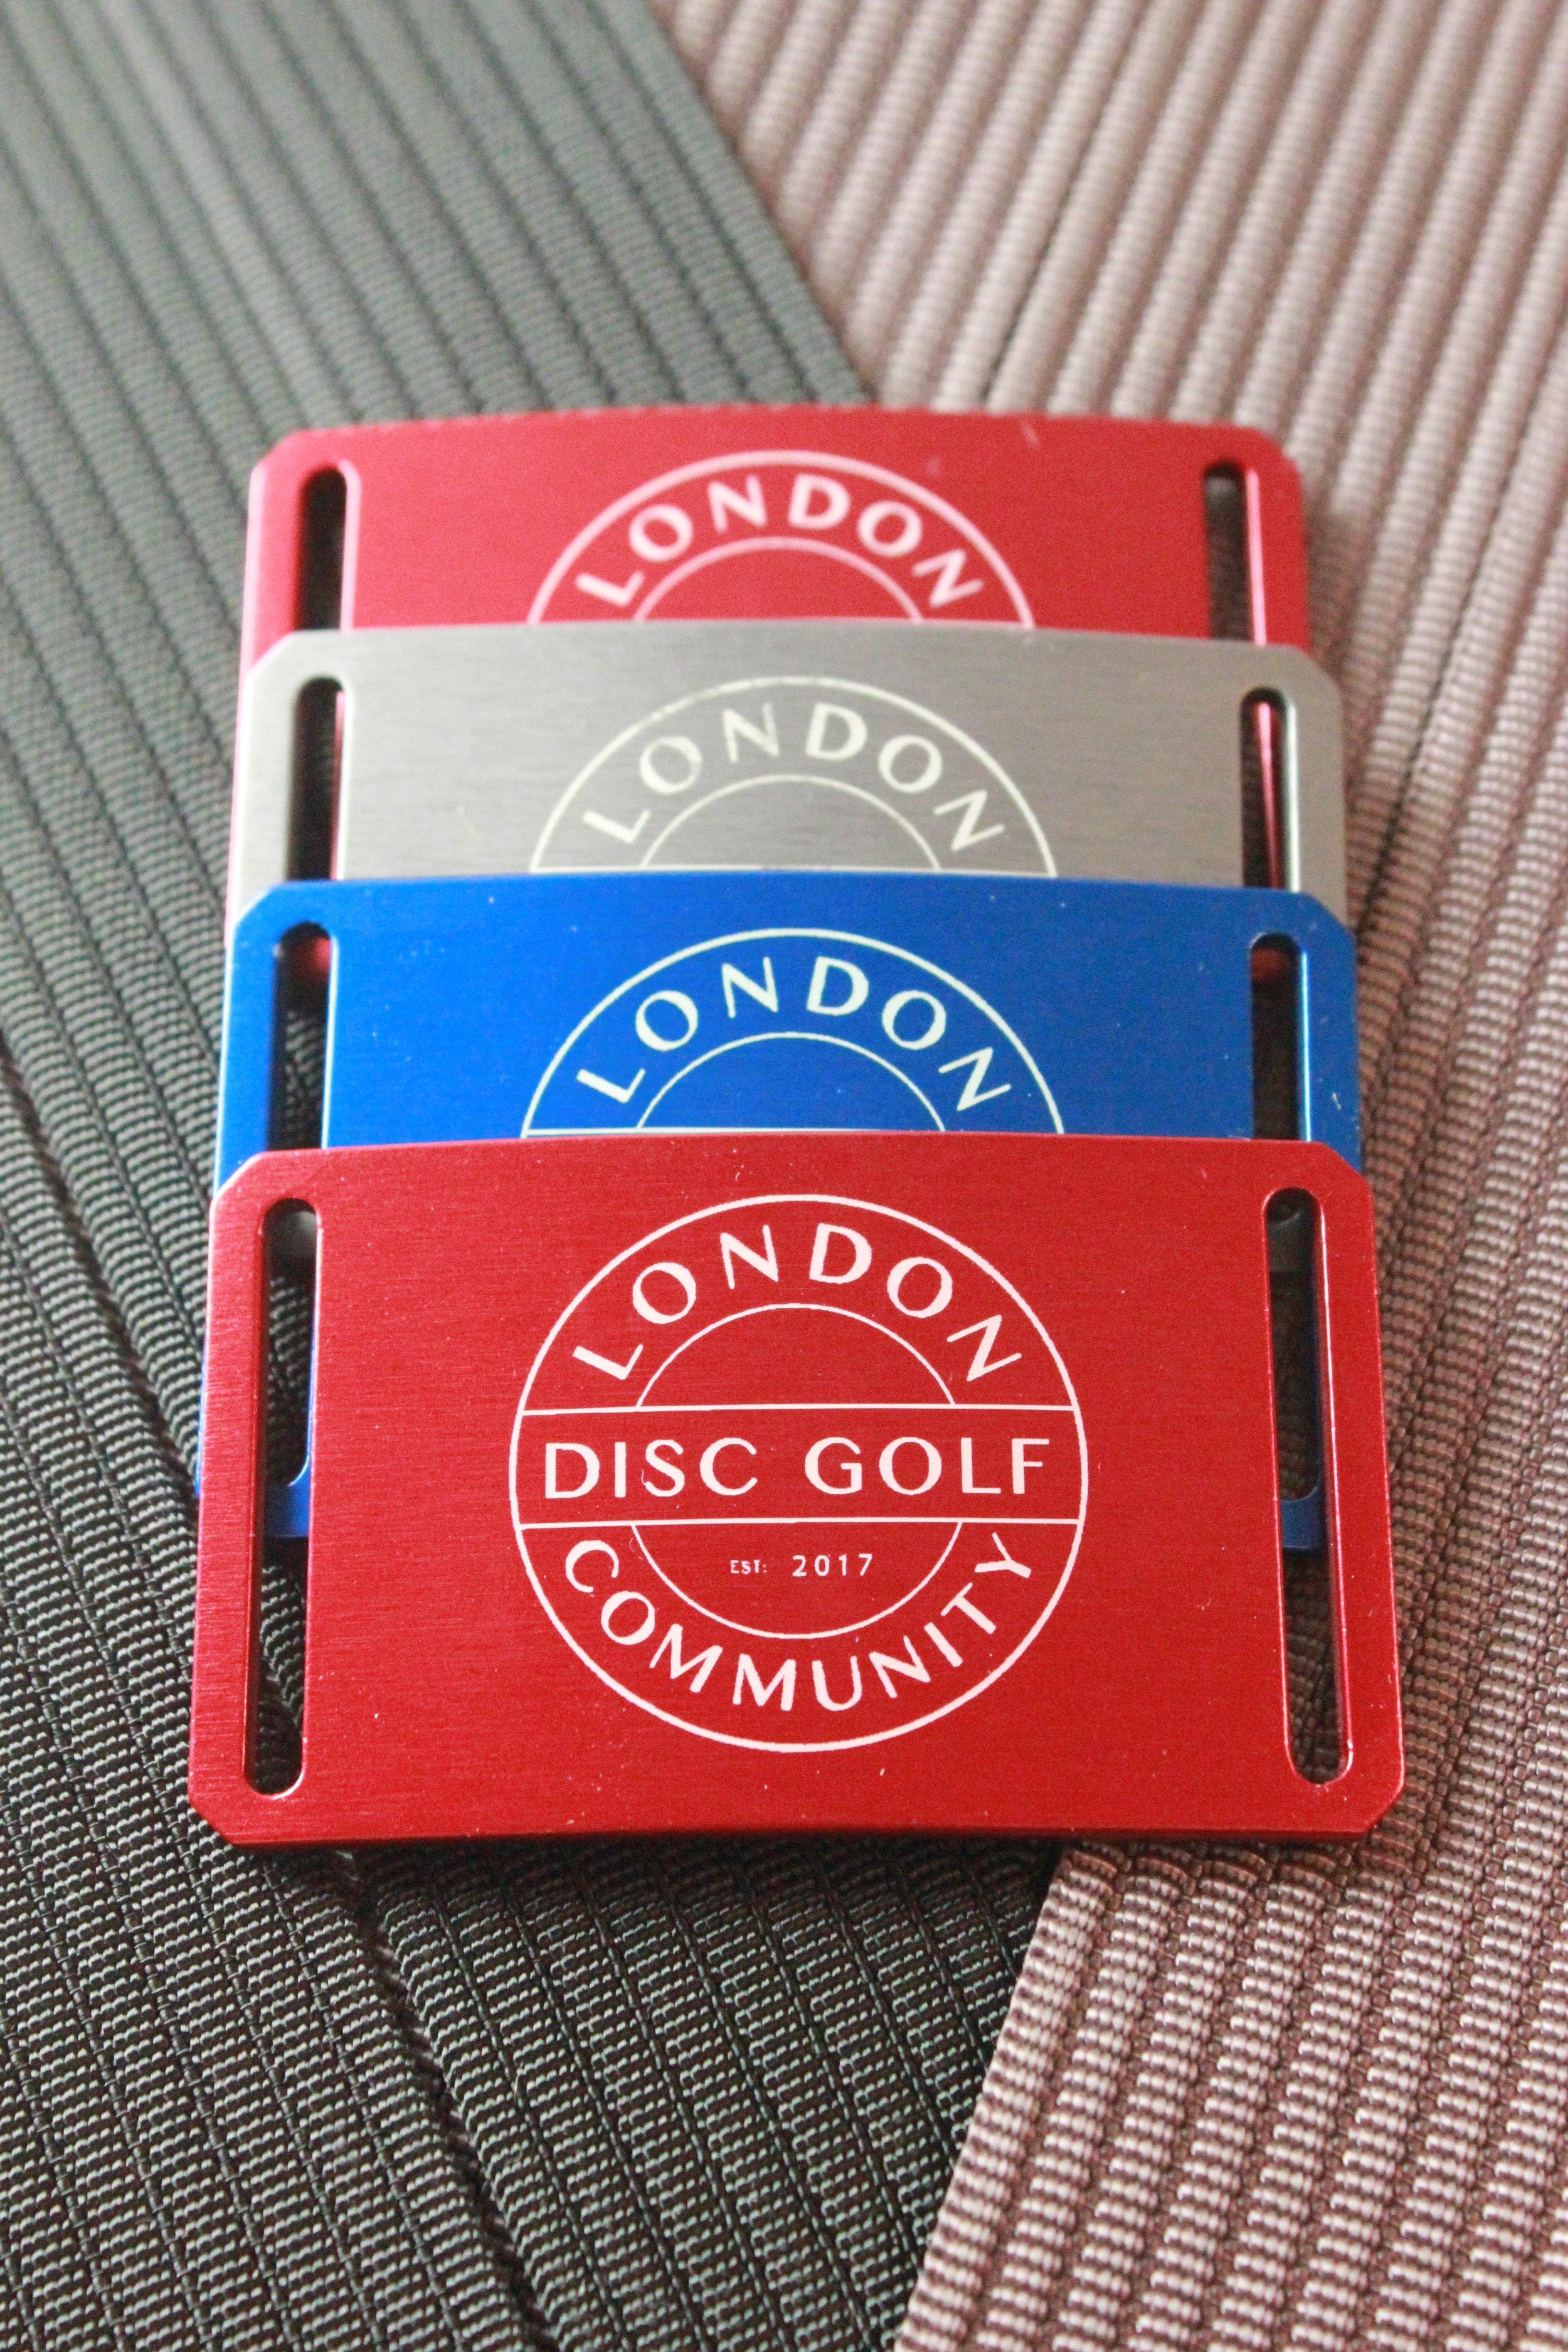 Limited Custom Grip6 Belts - London Disc Golf Community Design - £30